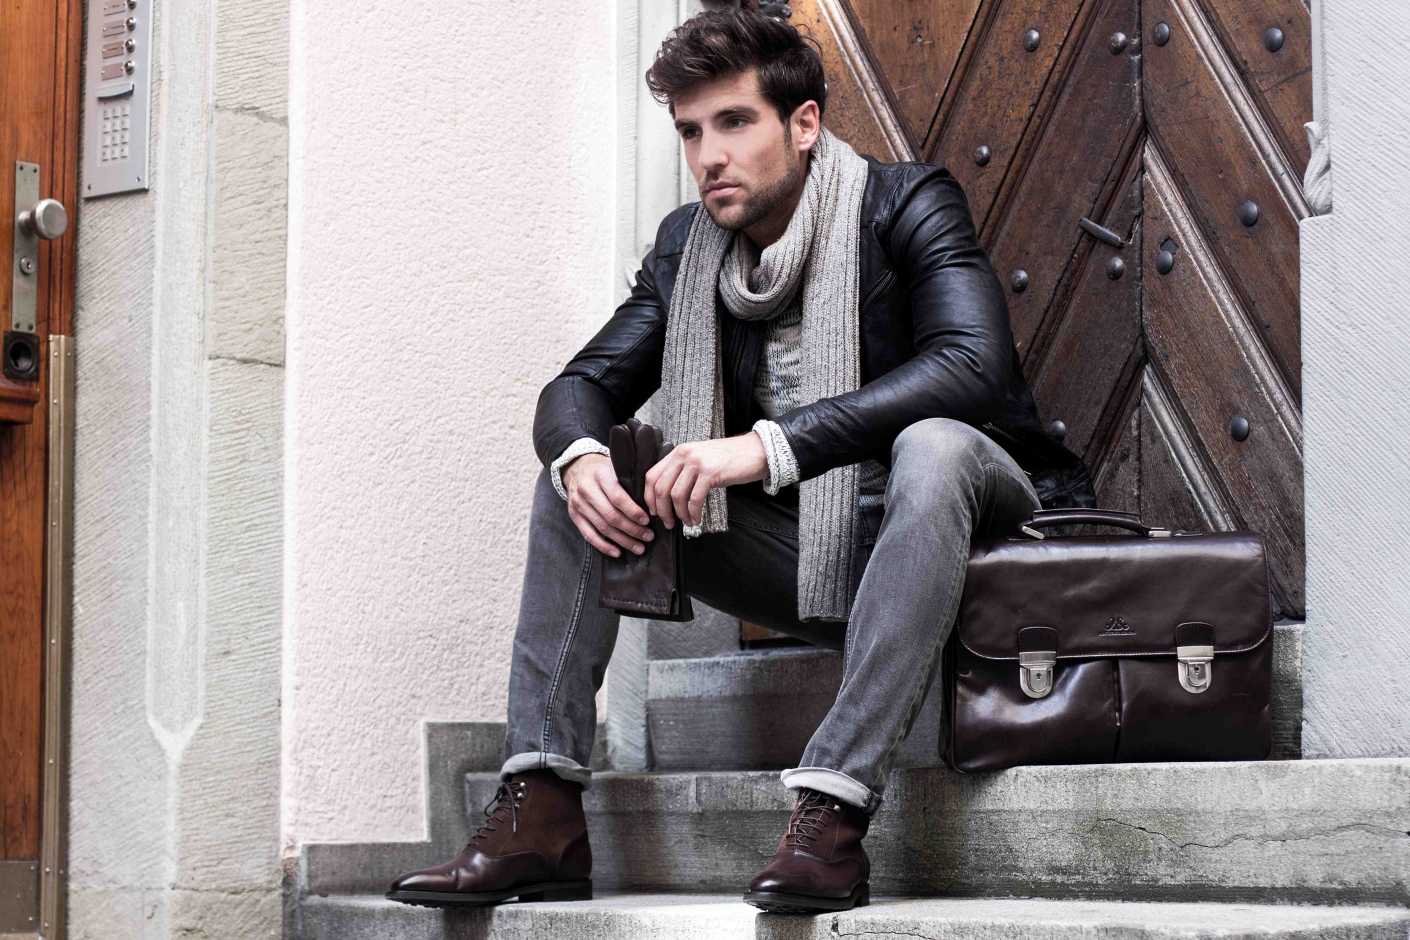 Shoes & Accessoires: Ochsner Shoes, Clothing: BigBoyz Zurich